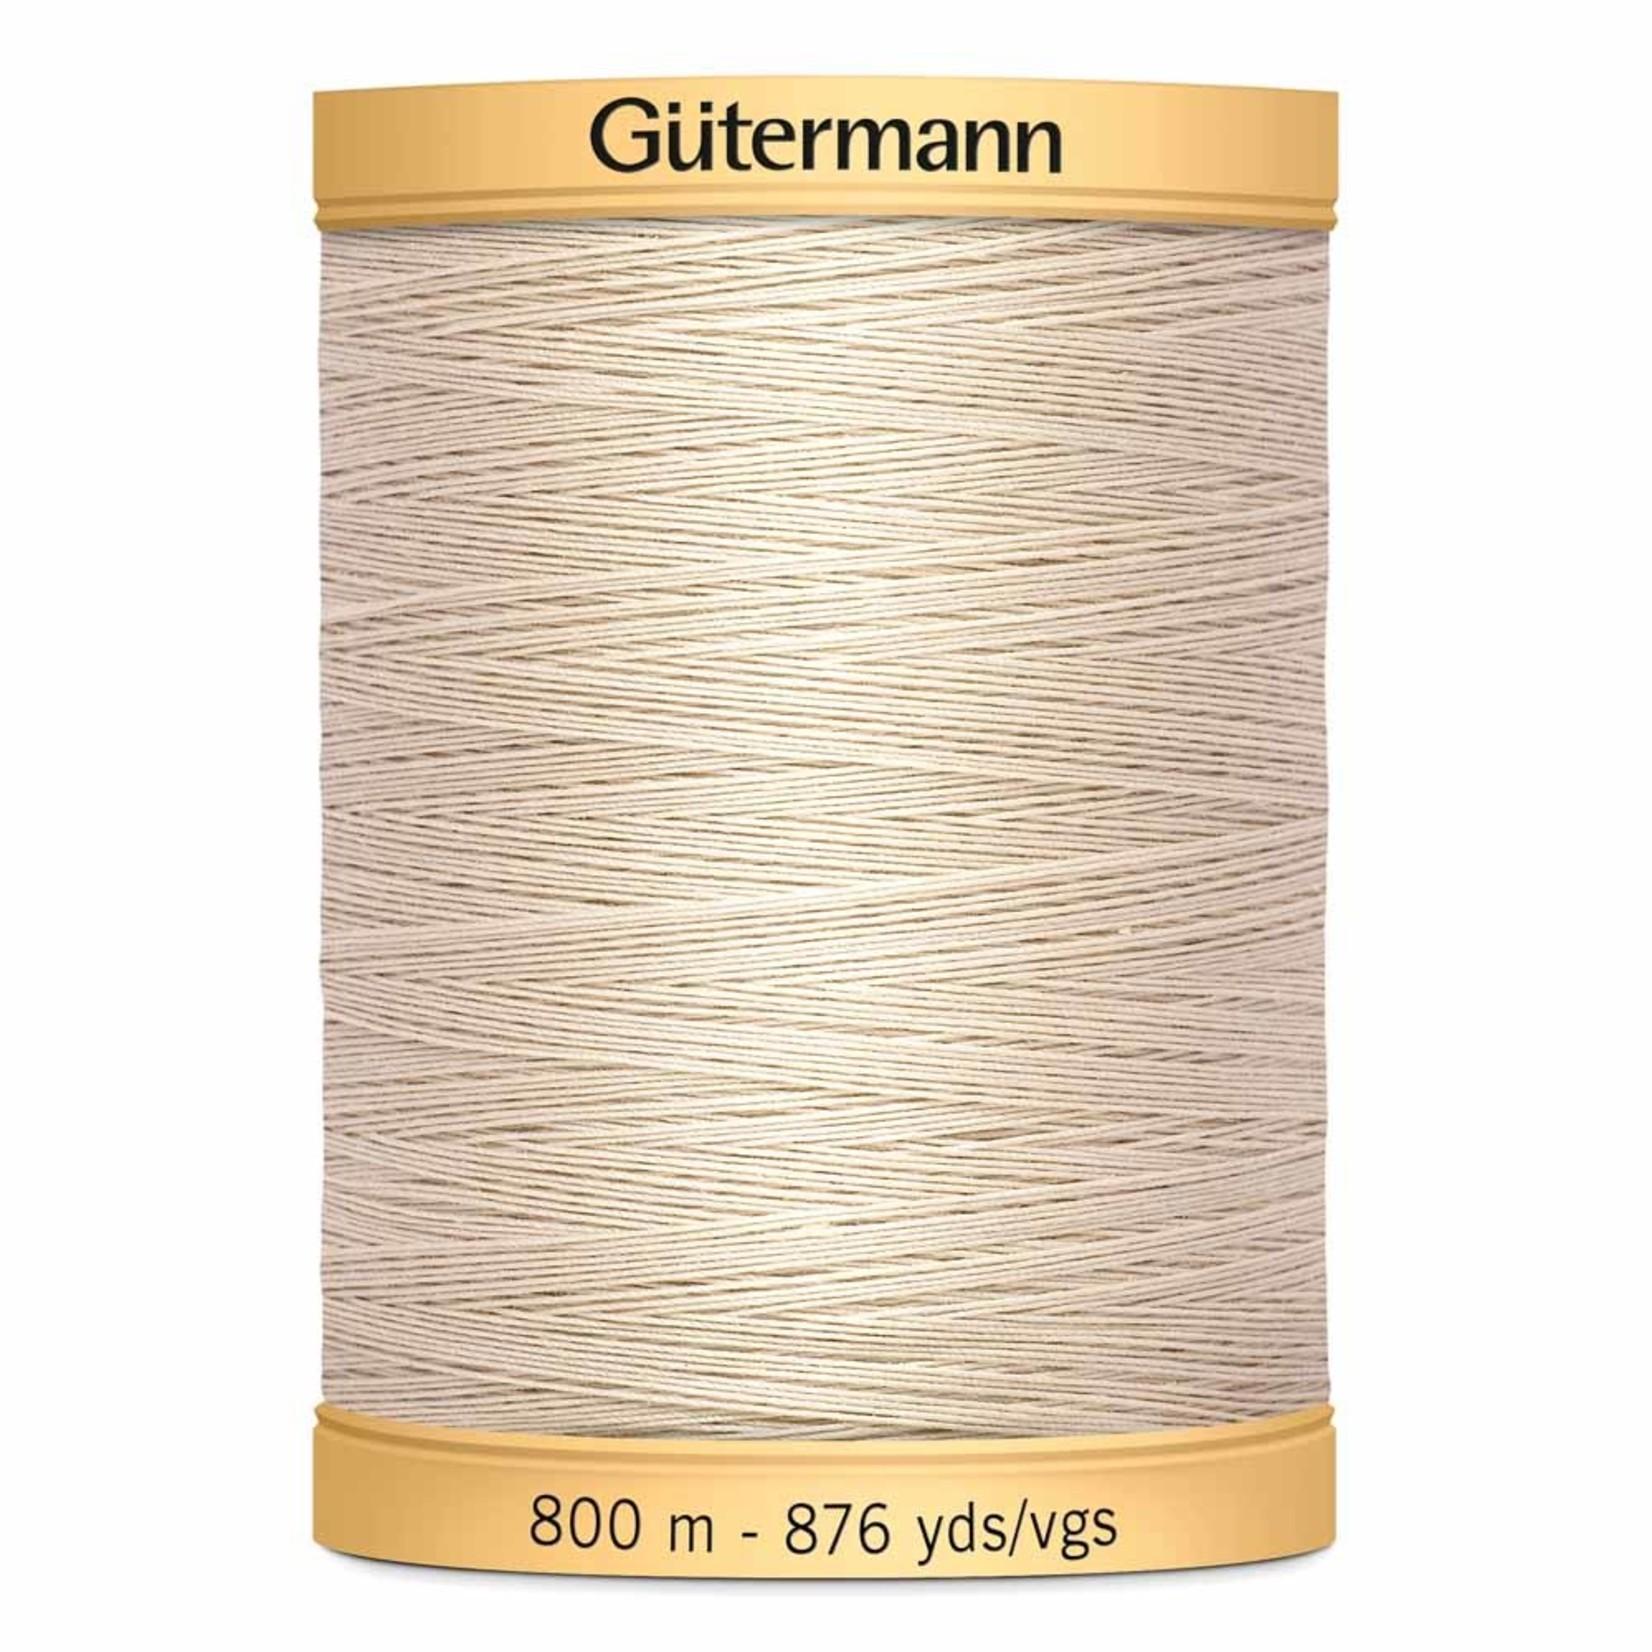 Guterman Col.0618 Gutermann Cotton 800m Pink Mushroom Lt Grey